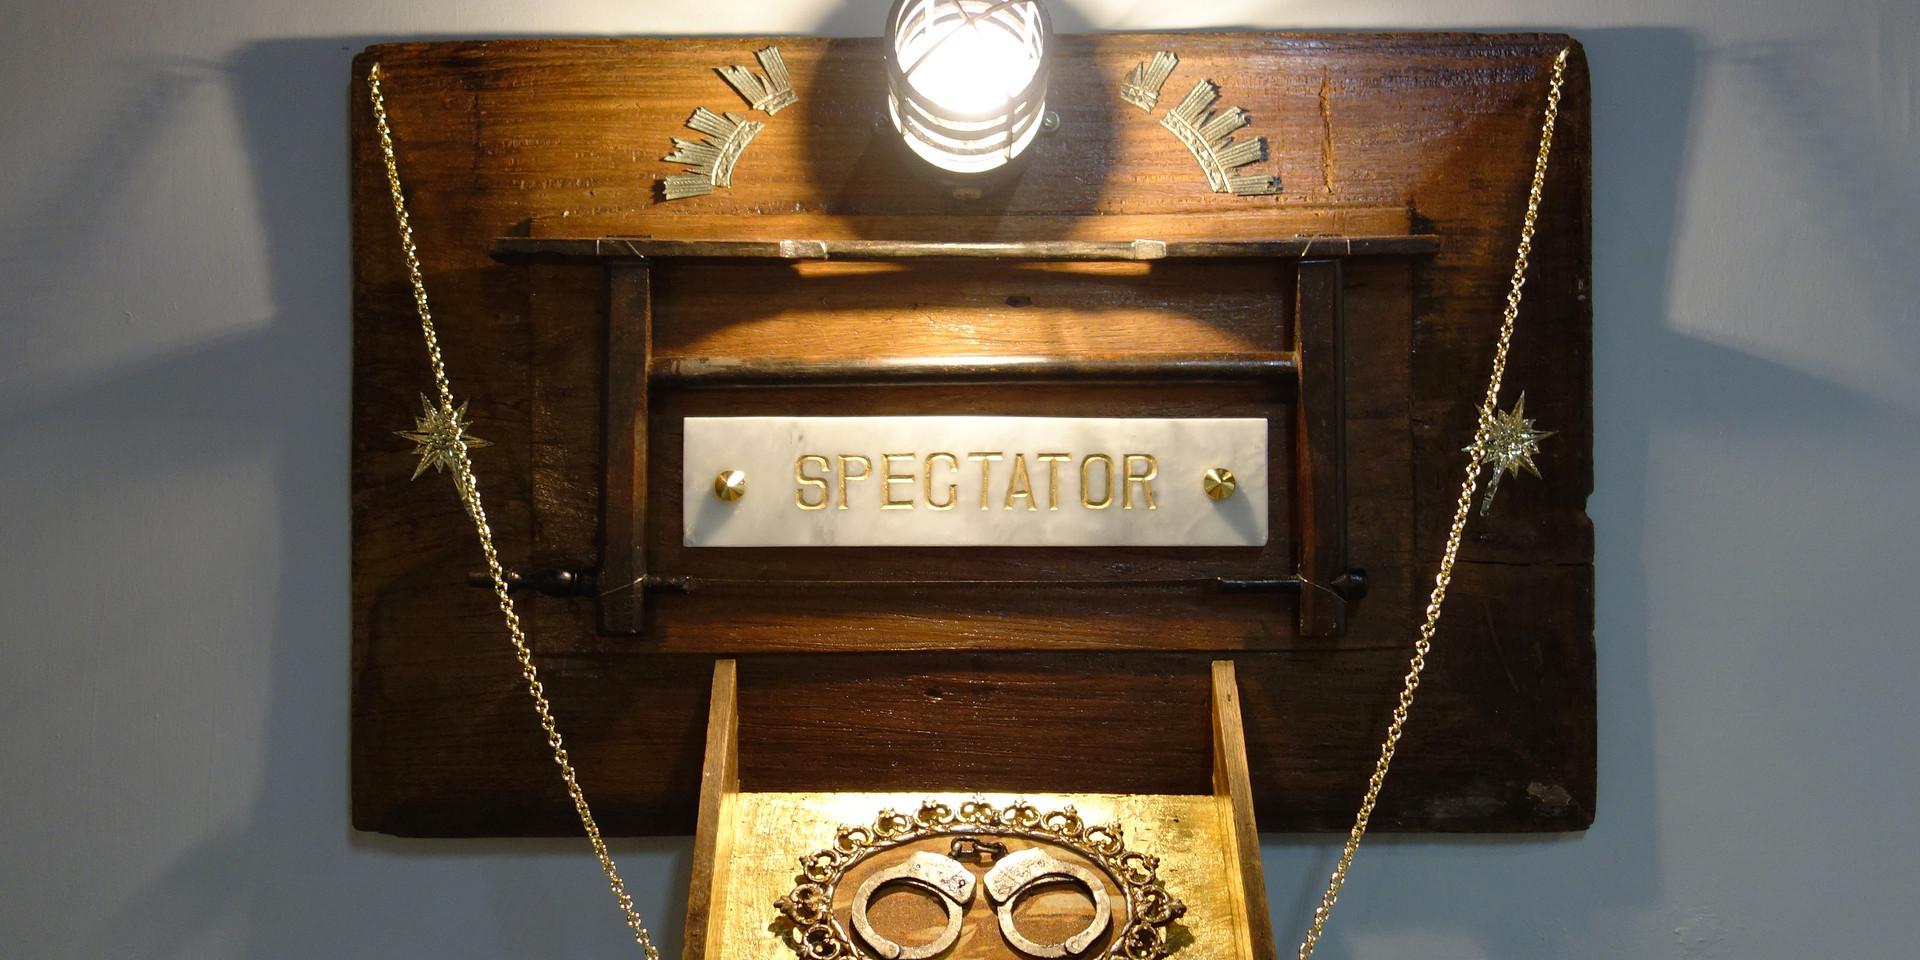 Spectator